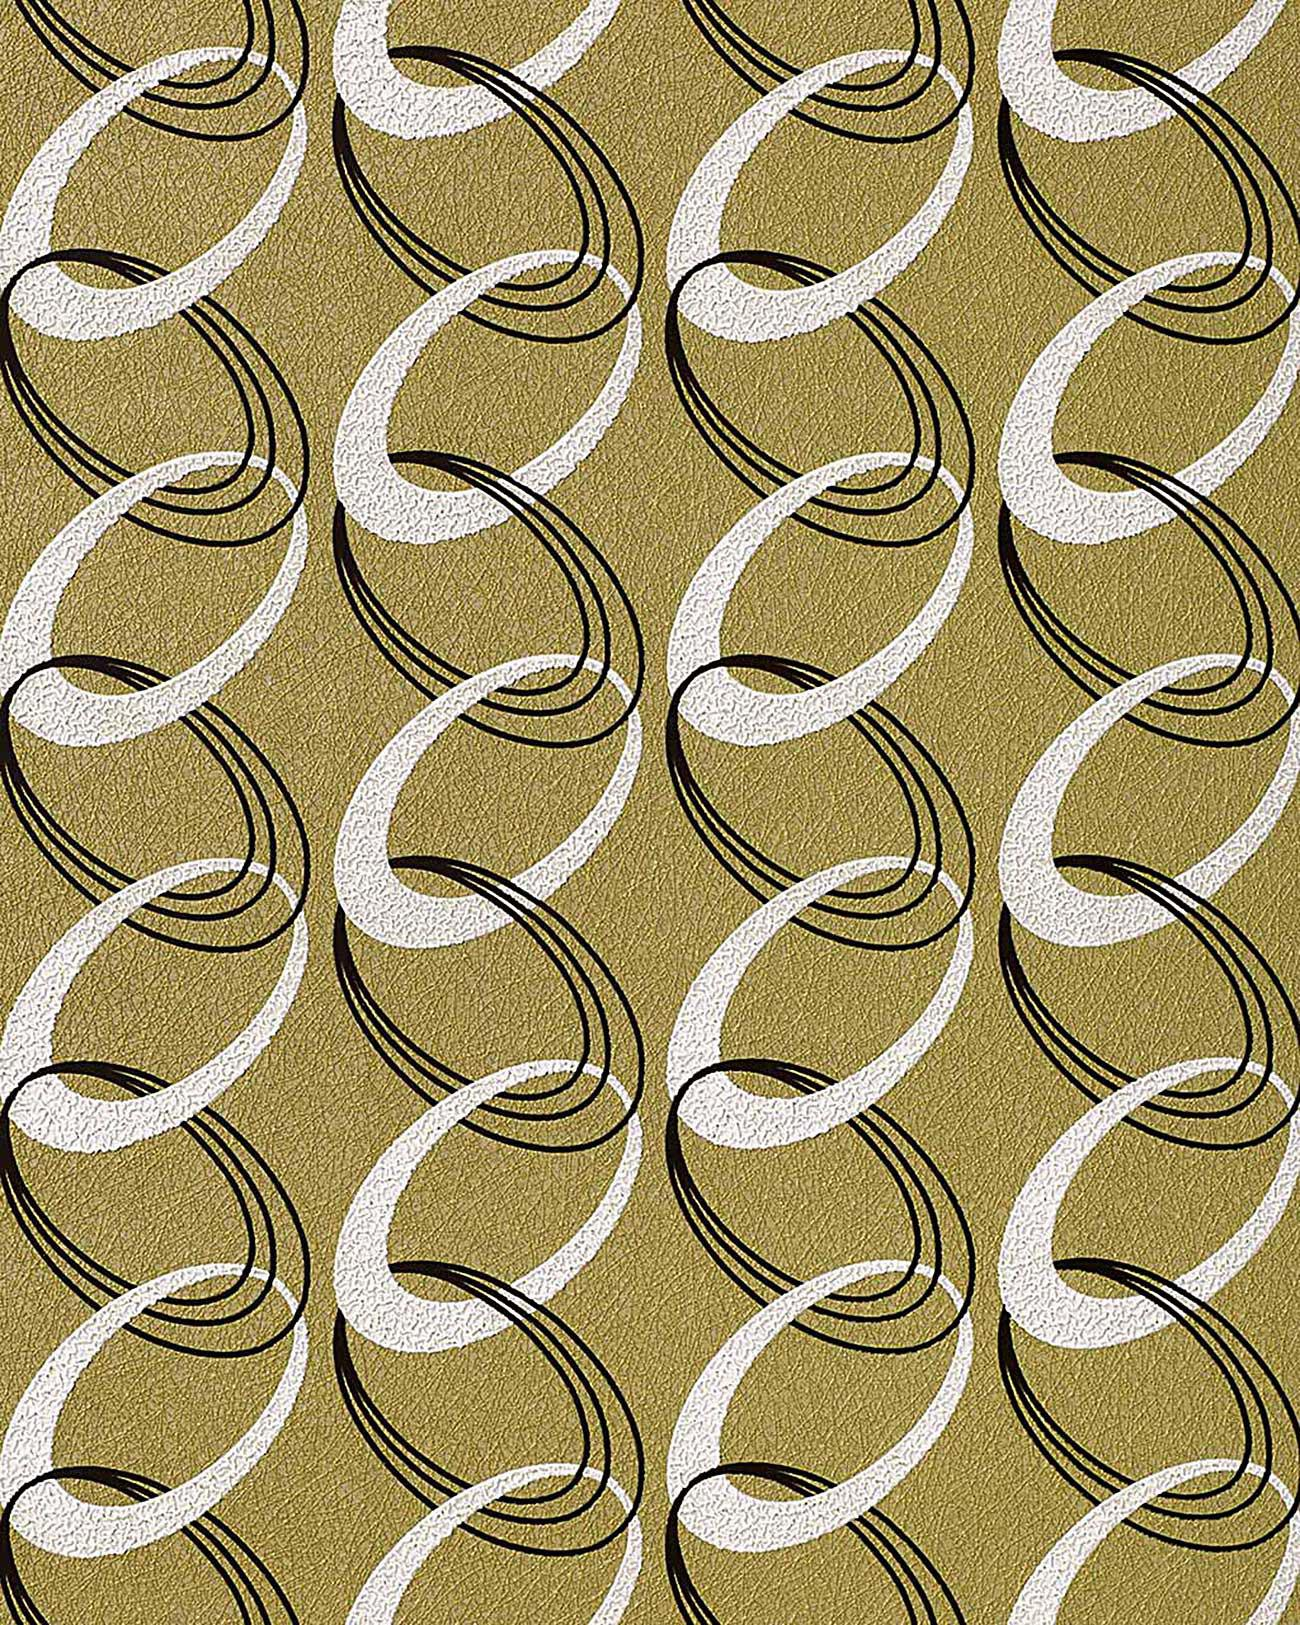 retro tapete edem 1017 15 retrotapete fashion designer 70er retro tapete ketten muster. Black Bedroom Furniture Sets. Home Design Ideas